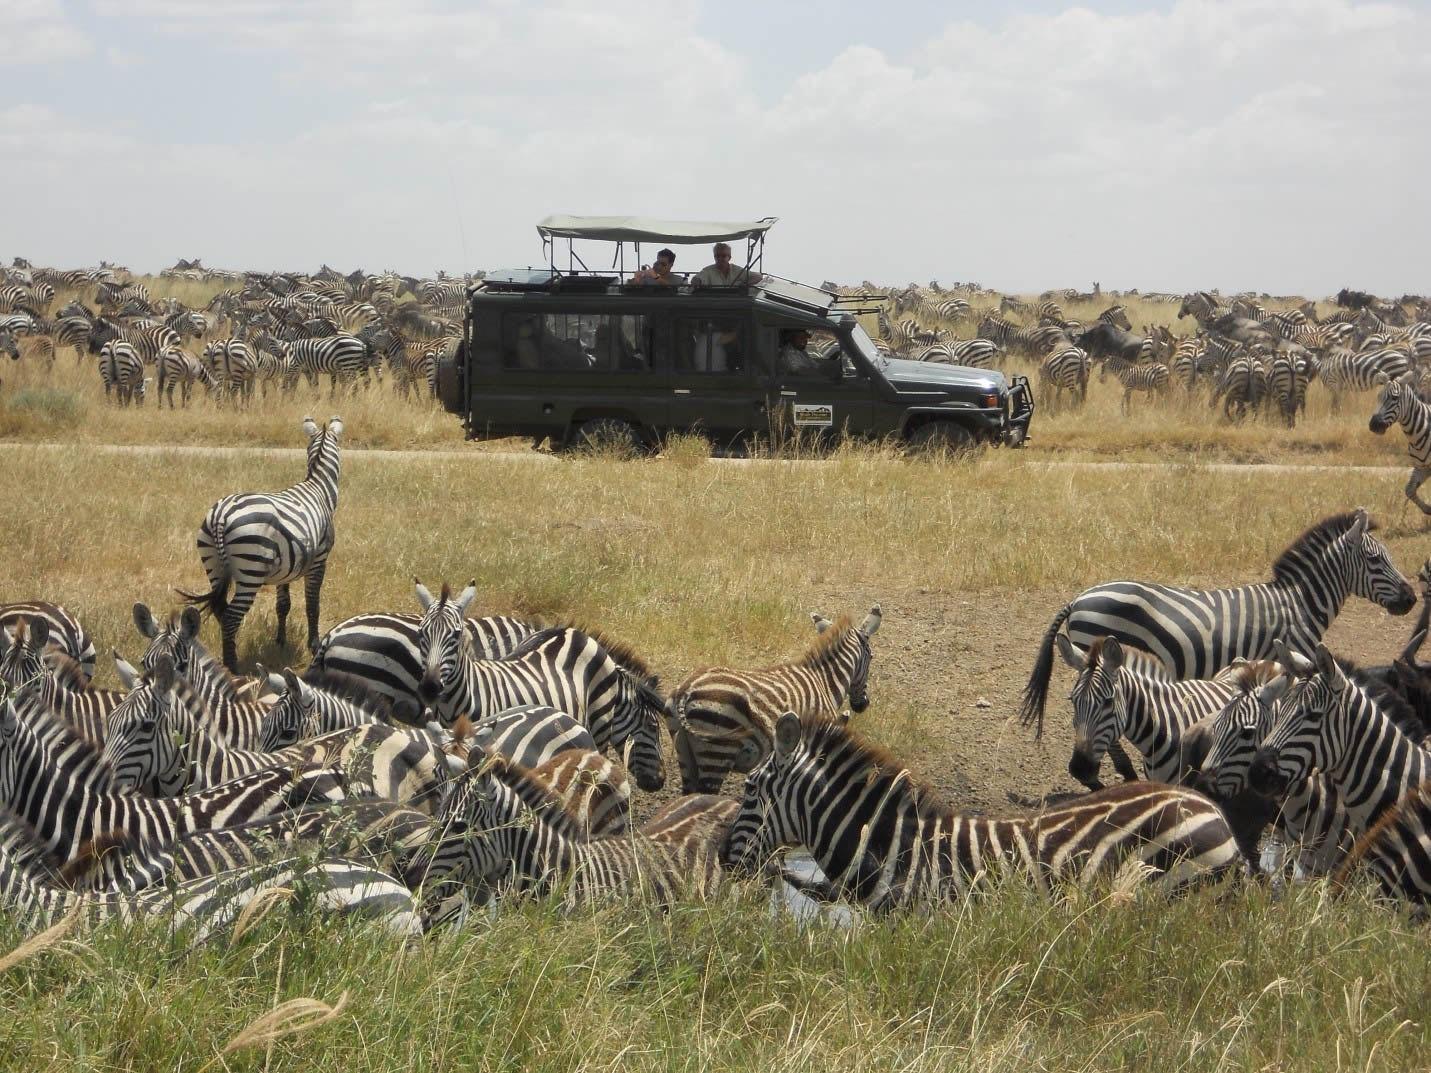 A long-wheel base Land Cruiser, stuck in a zebra-jam in central Serengeti!